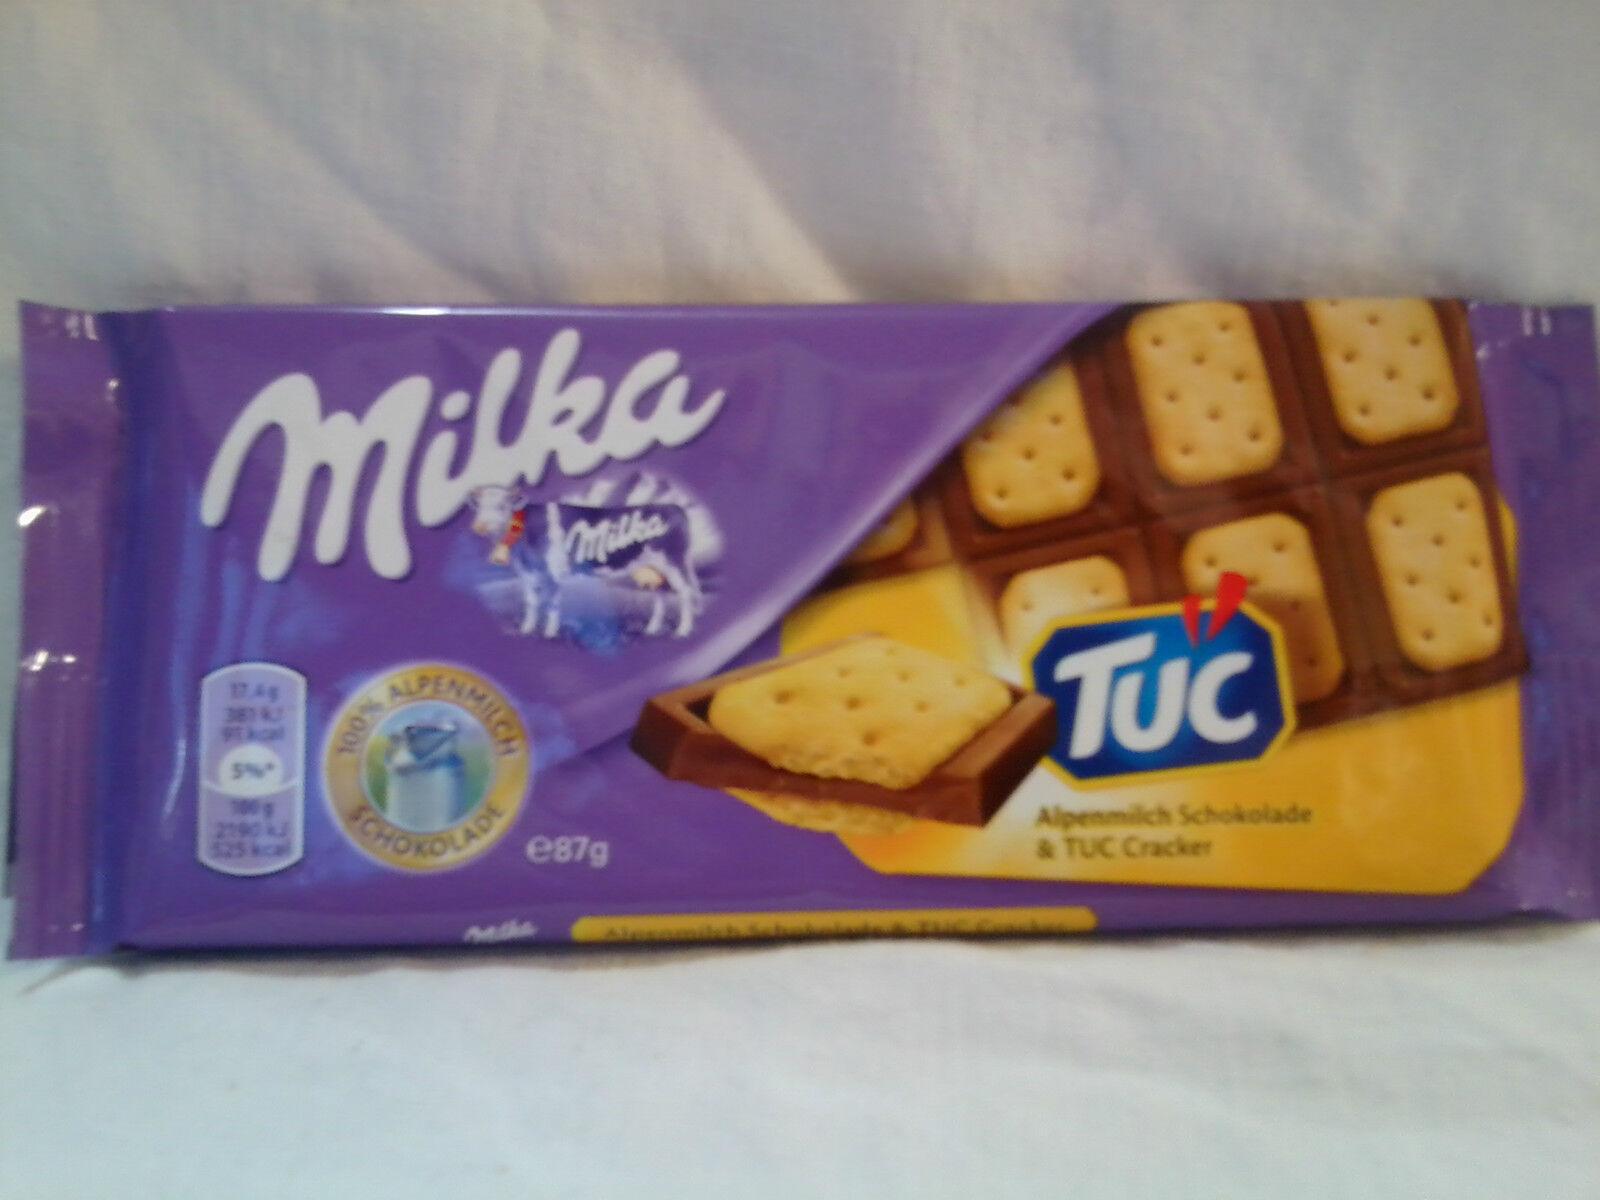 10 Tafeln Milka Alpenmilch Schokolade & TUC Cracker je 100g